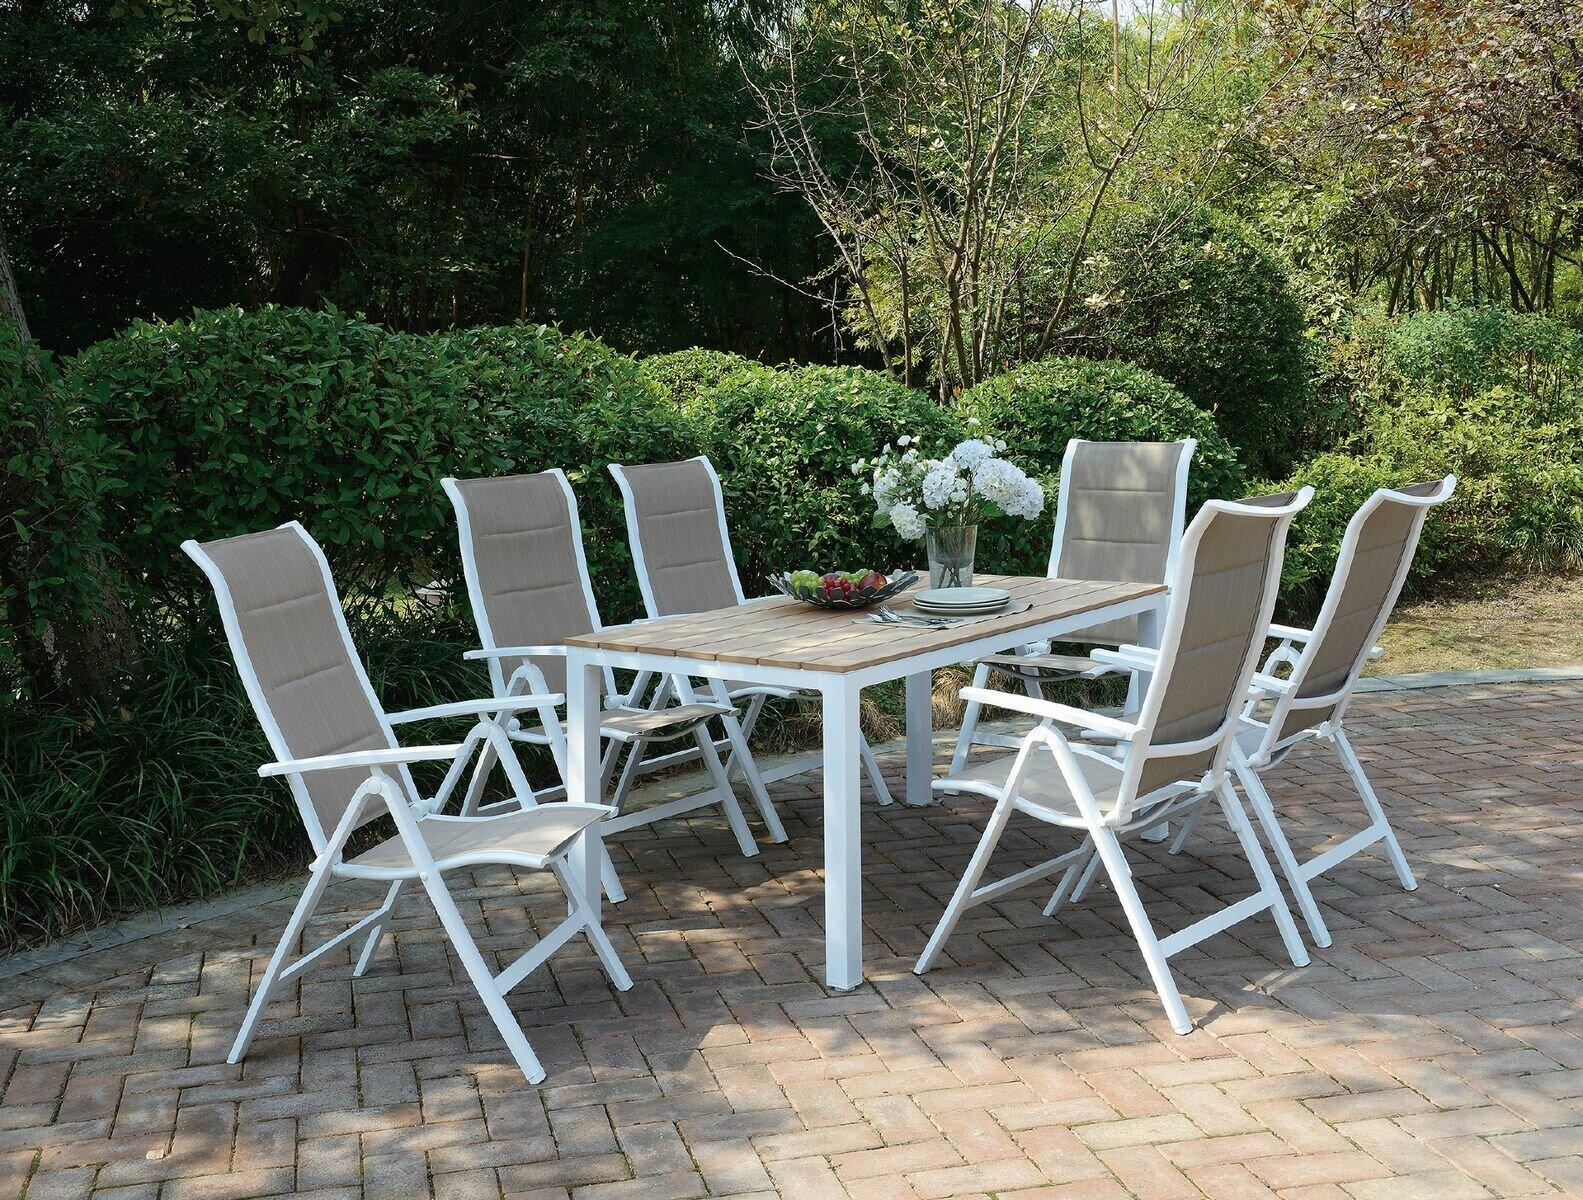 Furniture Chairs Folding Chair Plastic Black Space Saving For Kitchen Garden Outer 240n Home Furniture Diy Tohoku Morinagamilk Co Jp